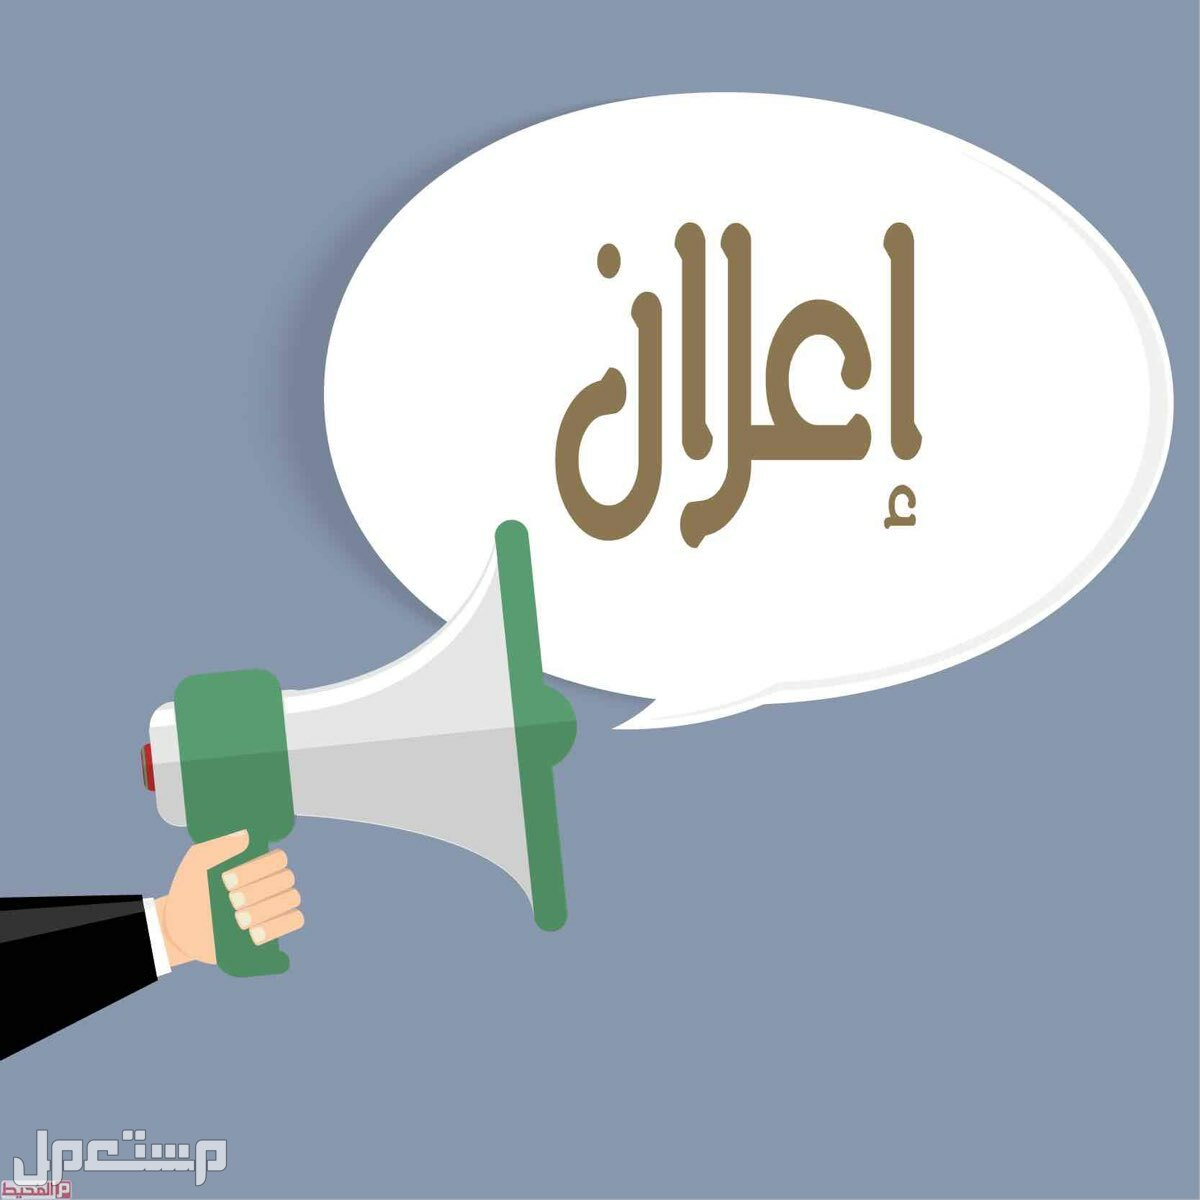 اعلان ودعم اغلان ودعم ونشر